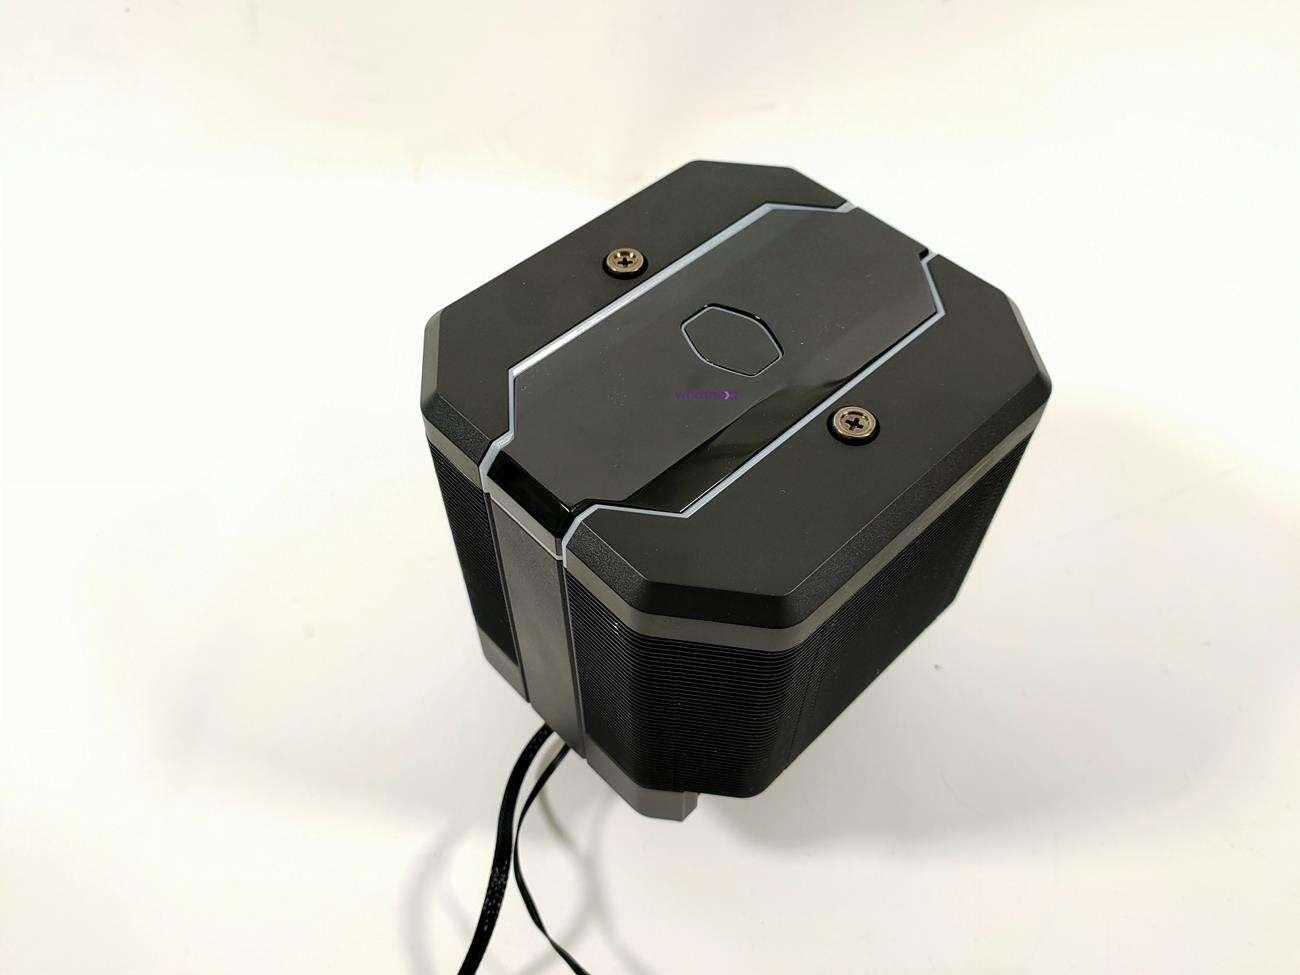 test Cooler Master MA620M, recenzja Cooler Master MA620M, review Cooler Master MA620M, opinia Cooler Master MA620M